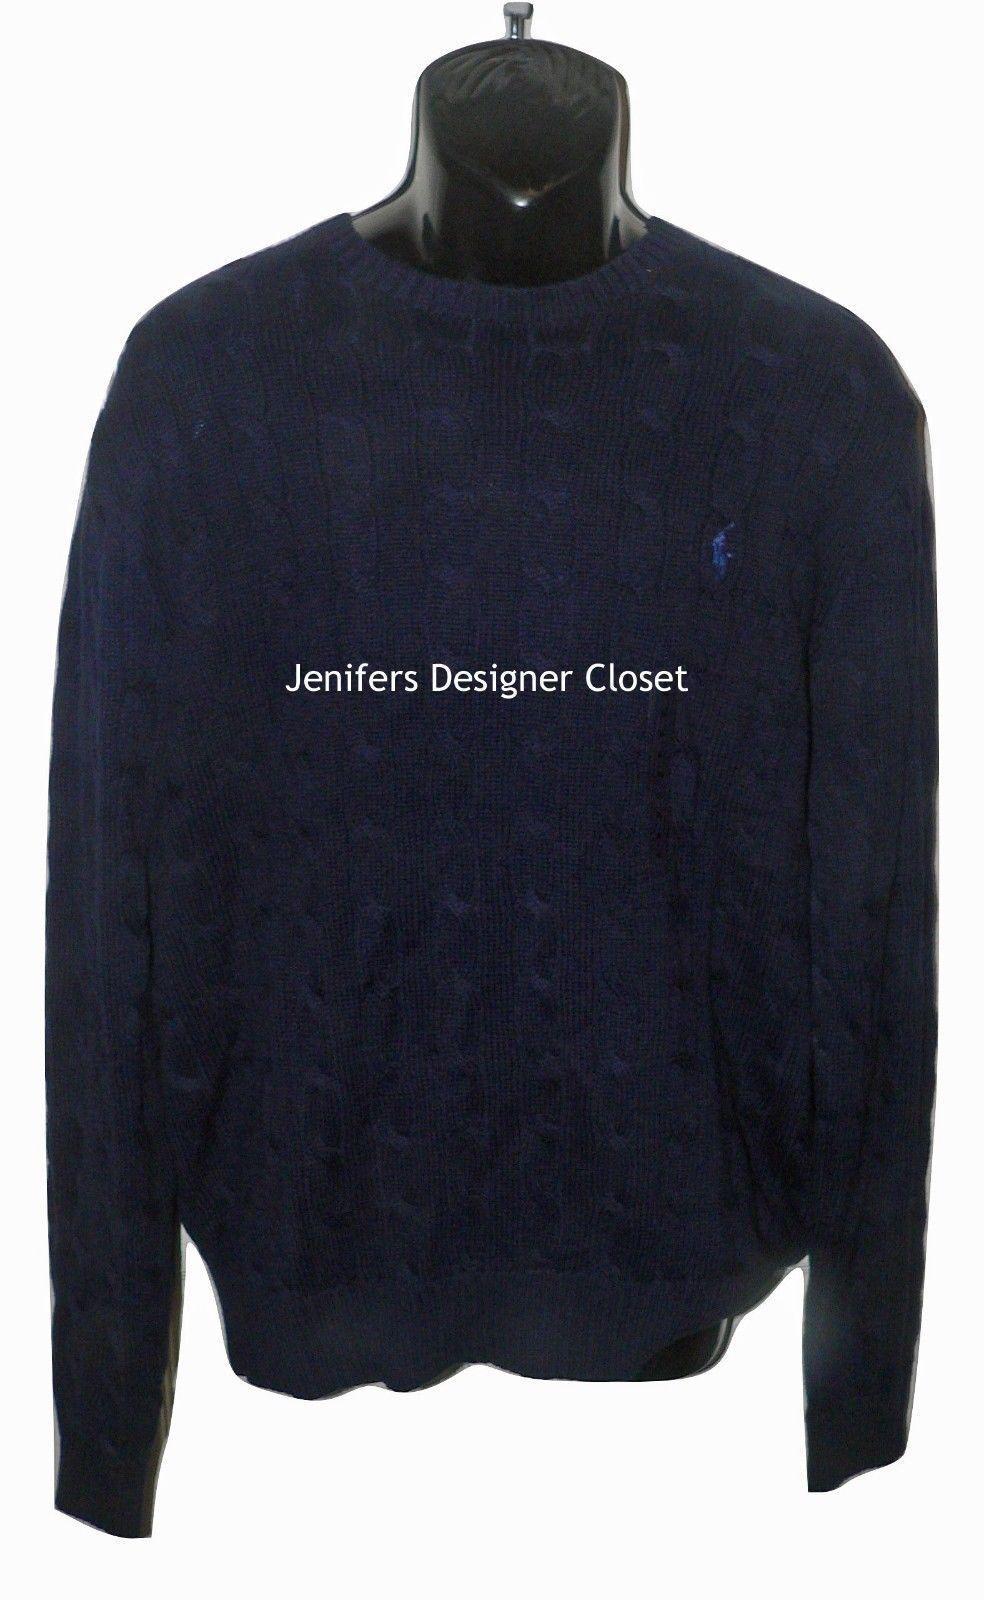 3ddfe3abc8b899 NWT POLO RALPH LAUREN XL cable knit crew neck sweater navy blue cotton men's